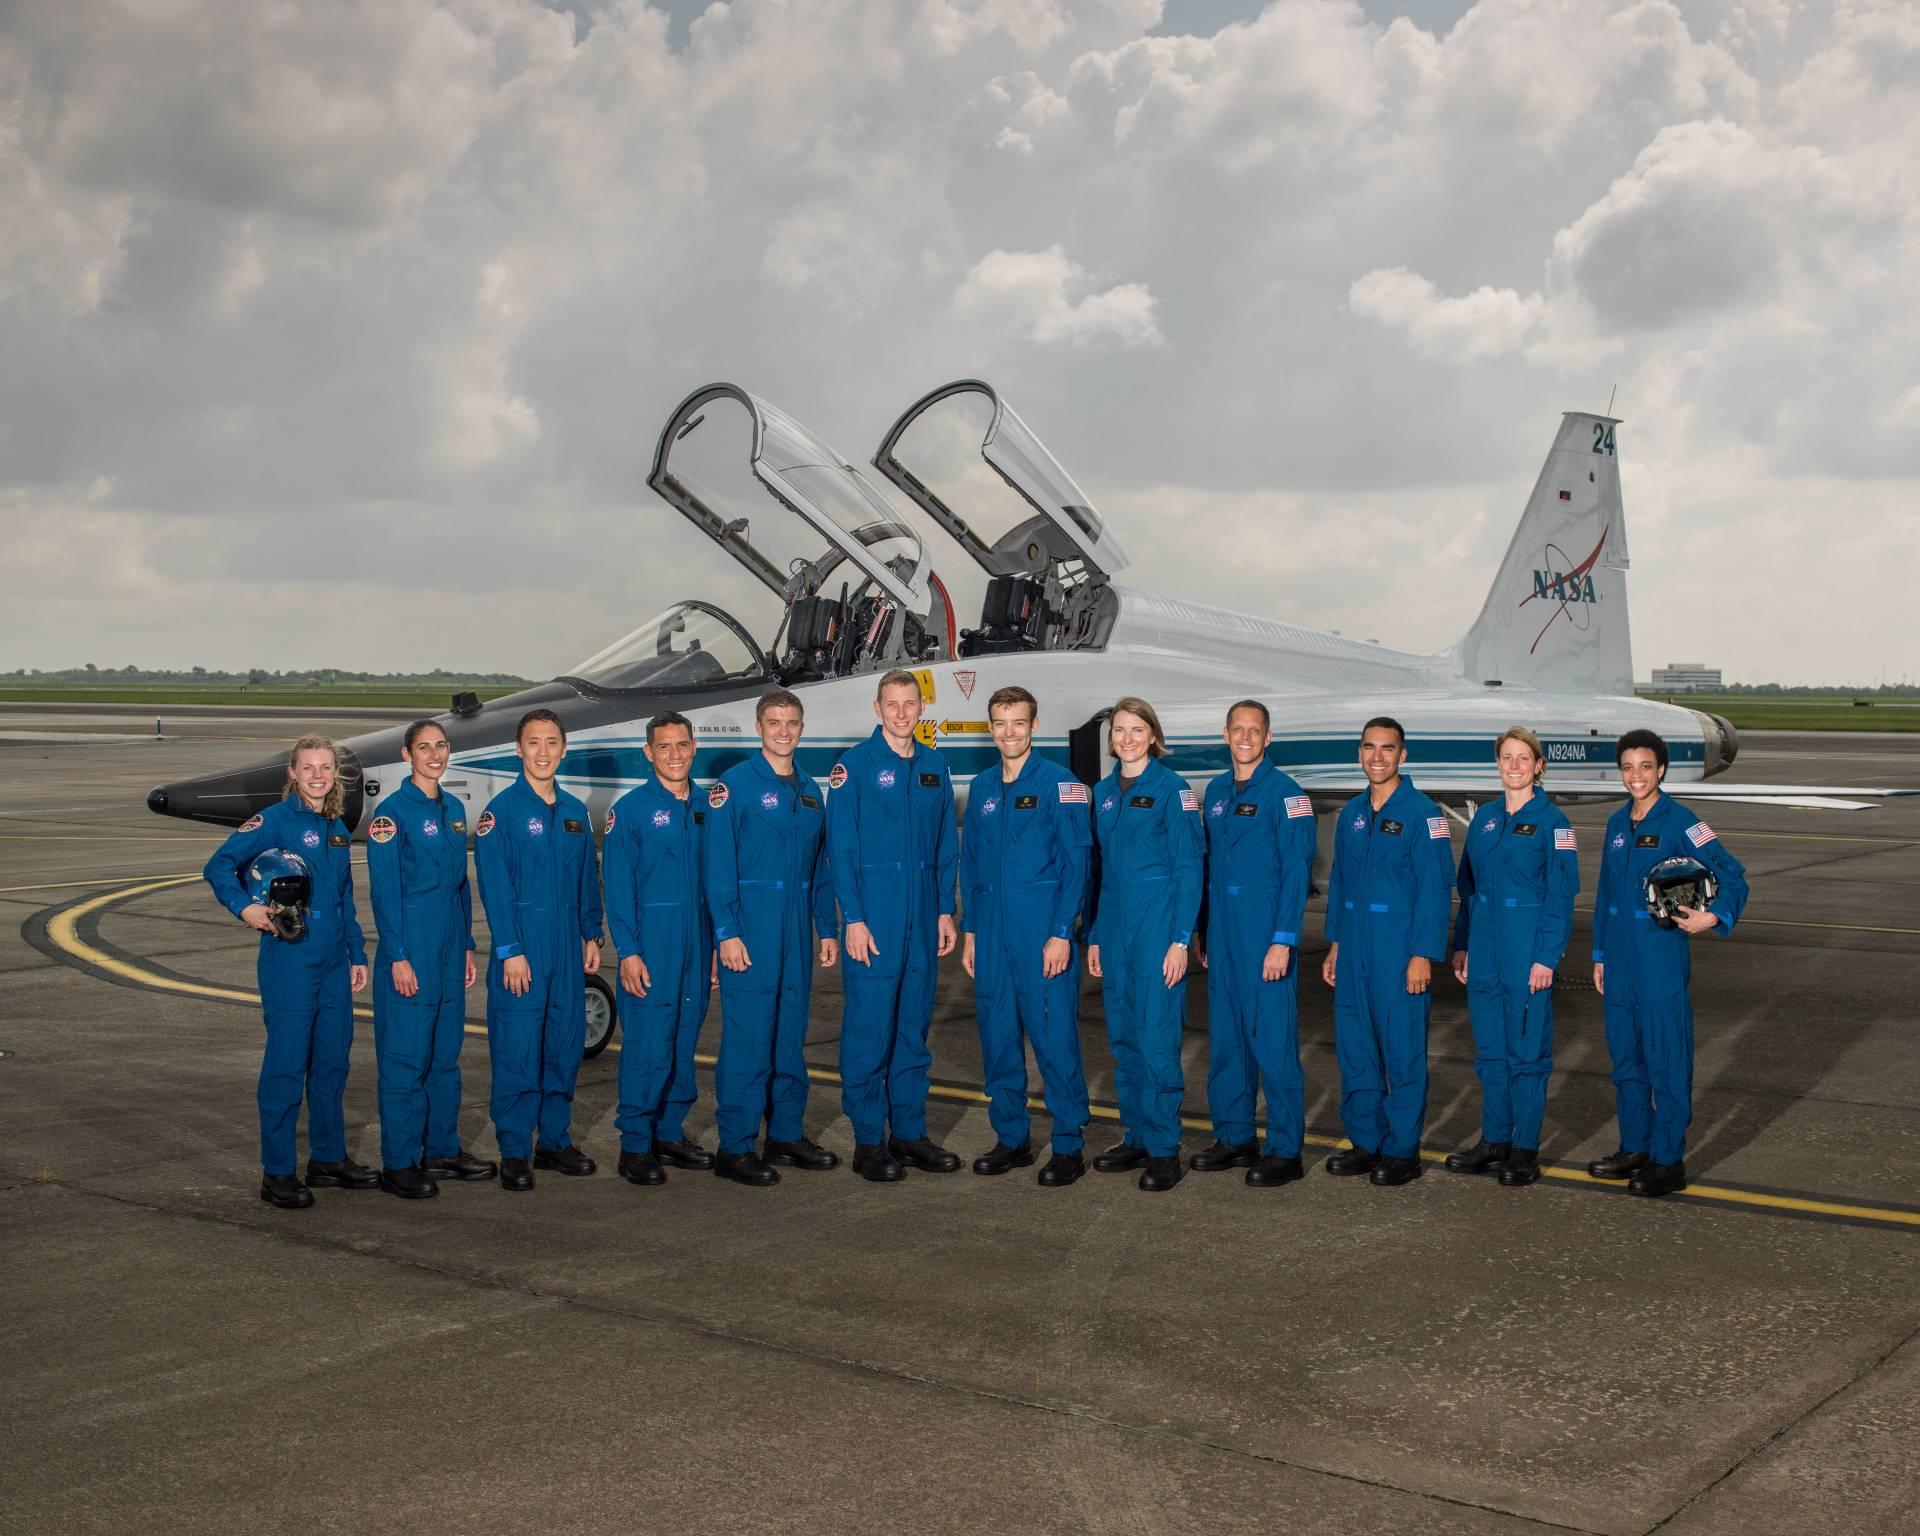 NASA Astronauts 2017